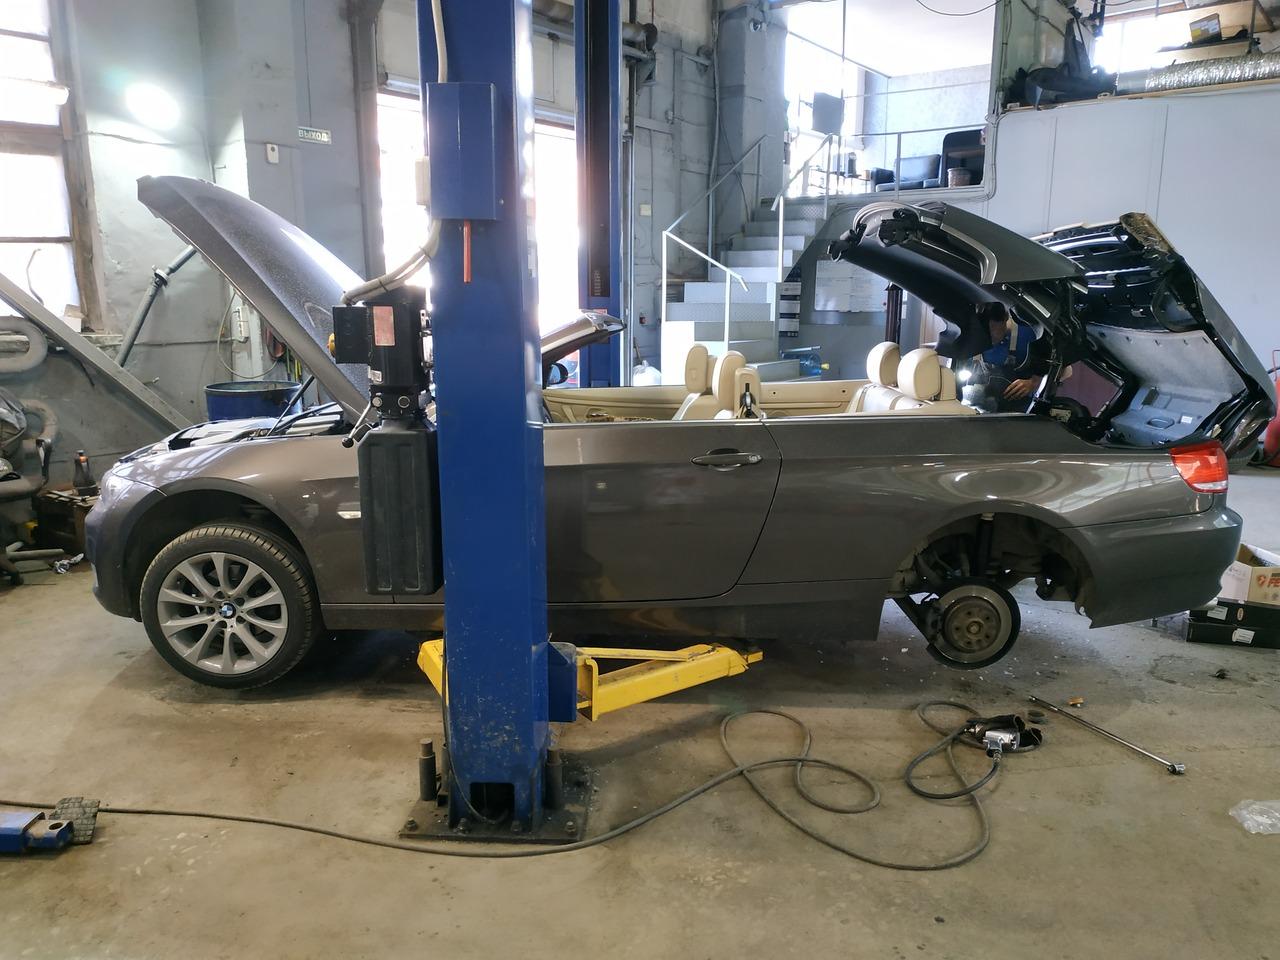 BMW E93 320i, 2009 года, Замена задних амортизаторов